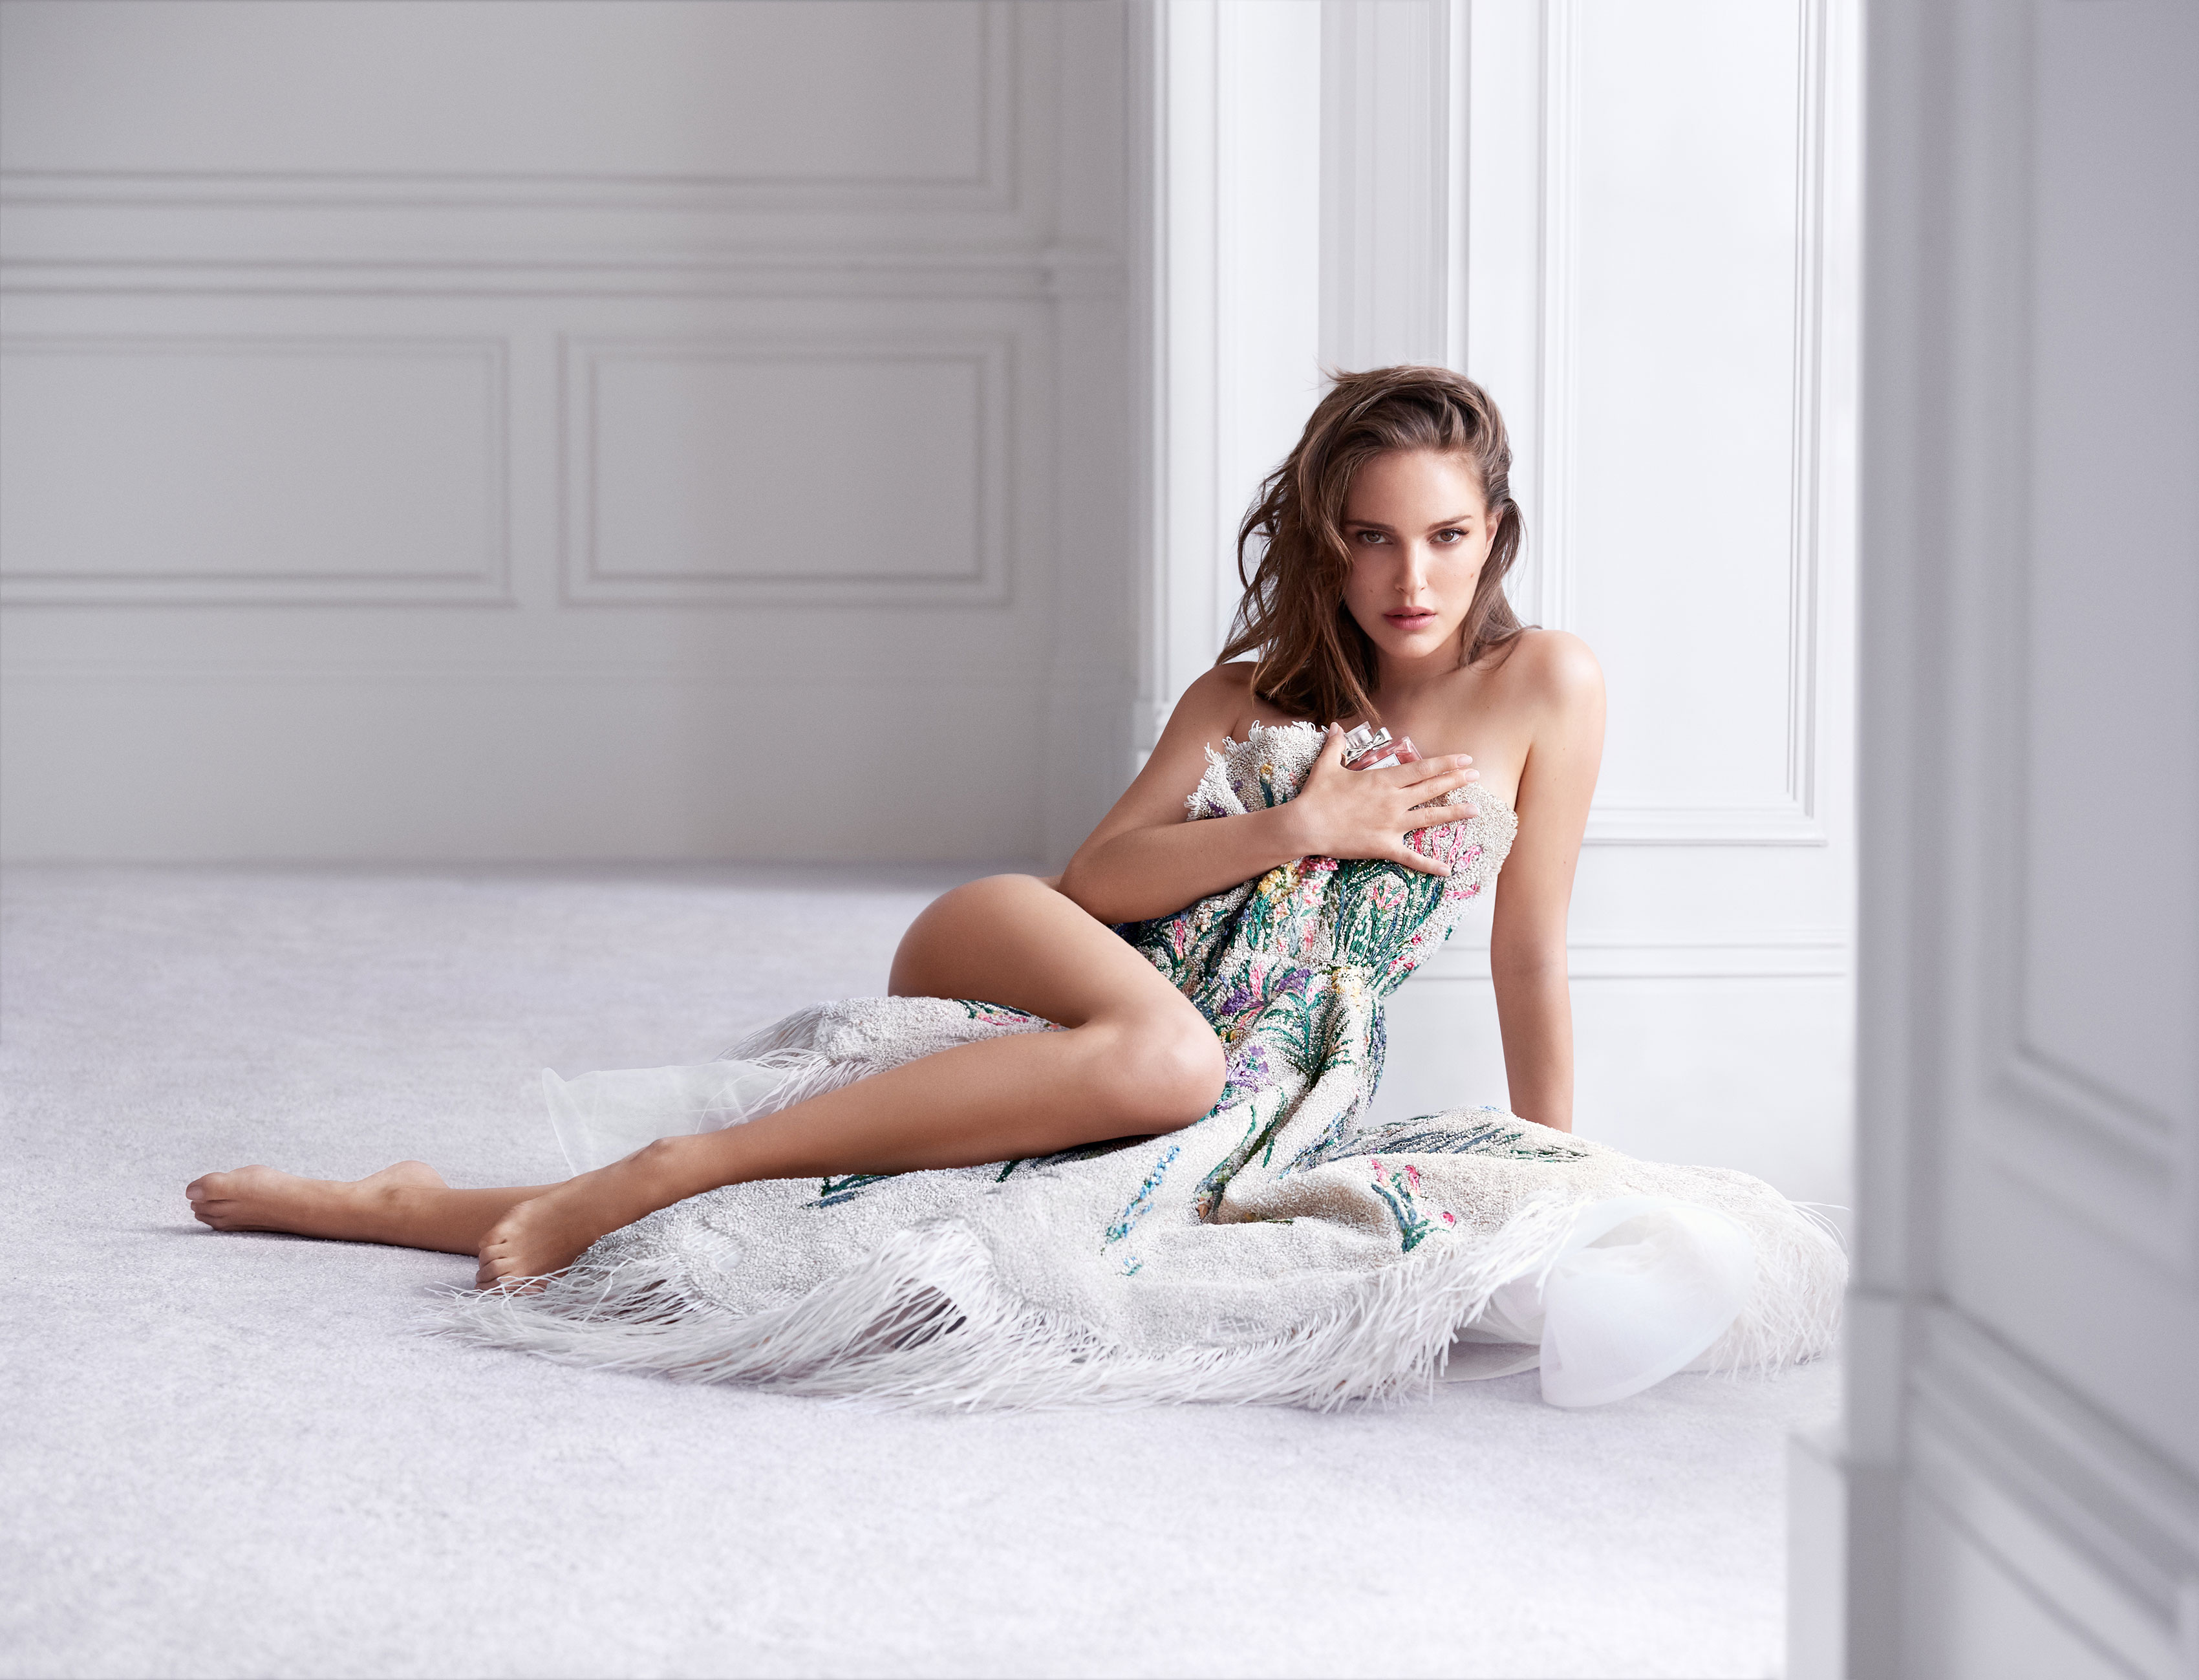 natalie-portman-is-incredibly-stunning